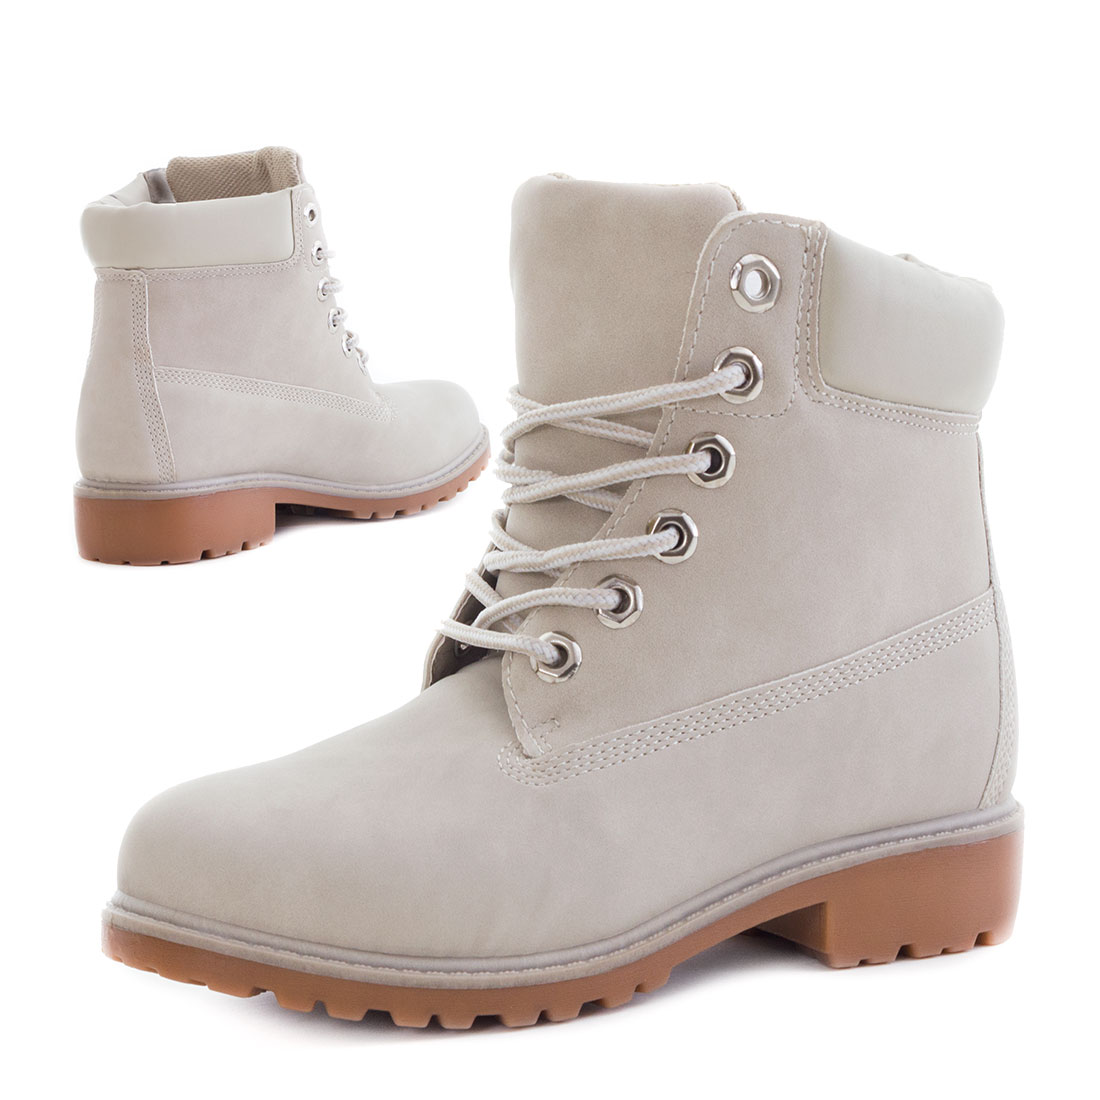 unisex damen herren bequeme winter schuhe boots kunstfell. Black Bedroom Furniture Sets. Home Design Ideas